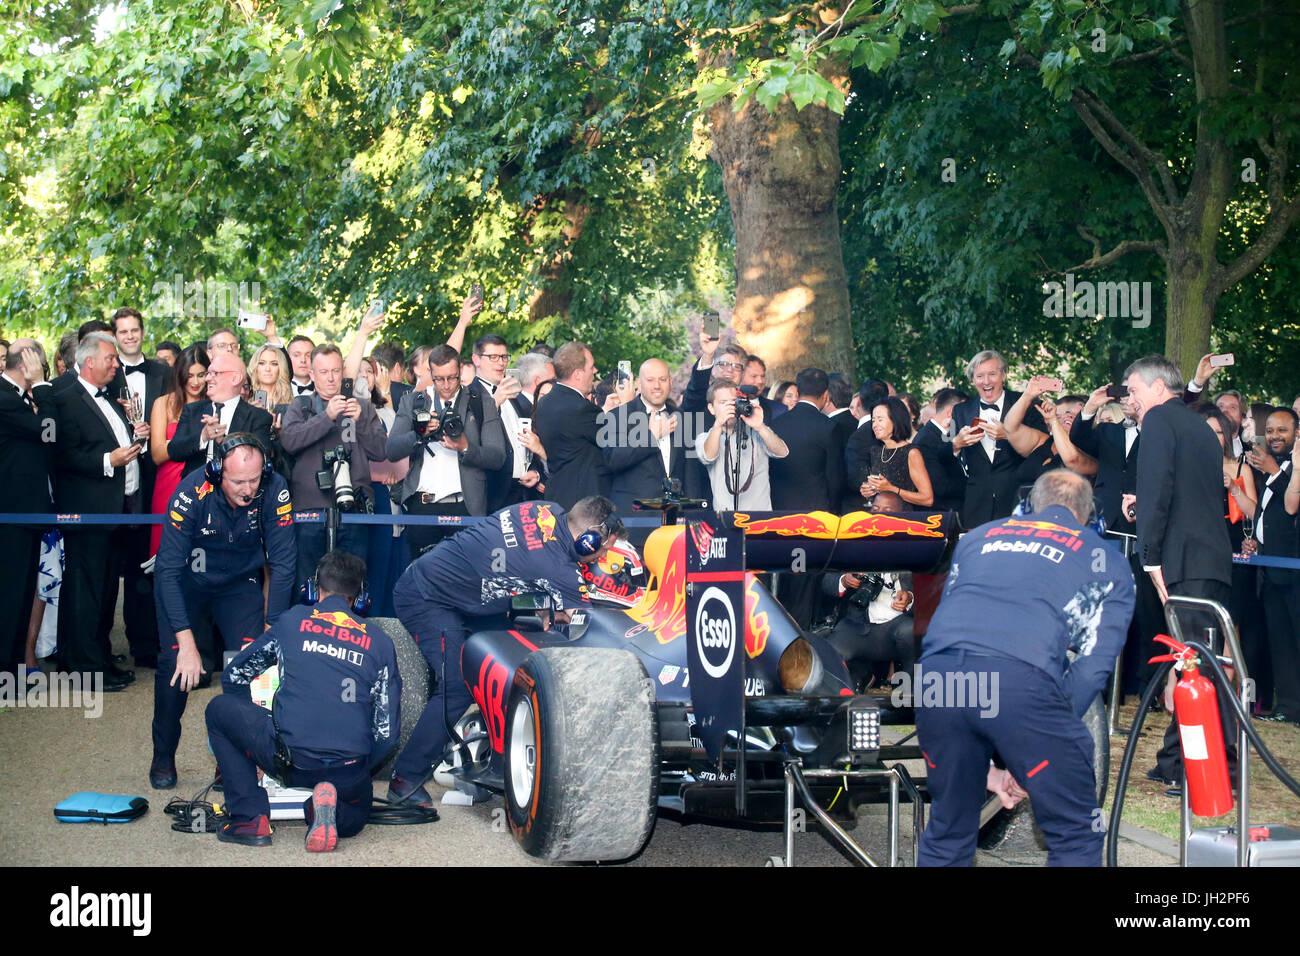 London, 12. Juni 2017. Grand Prix Ball, Prominente, Autos und Fahrer im Hurlingham Club. Expo-Foto/Alamy Live-Nachrichten Stockbild